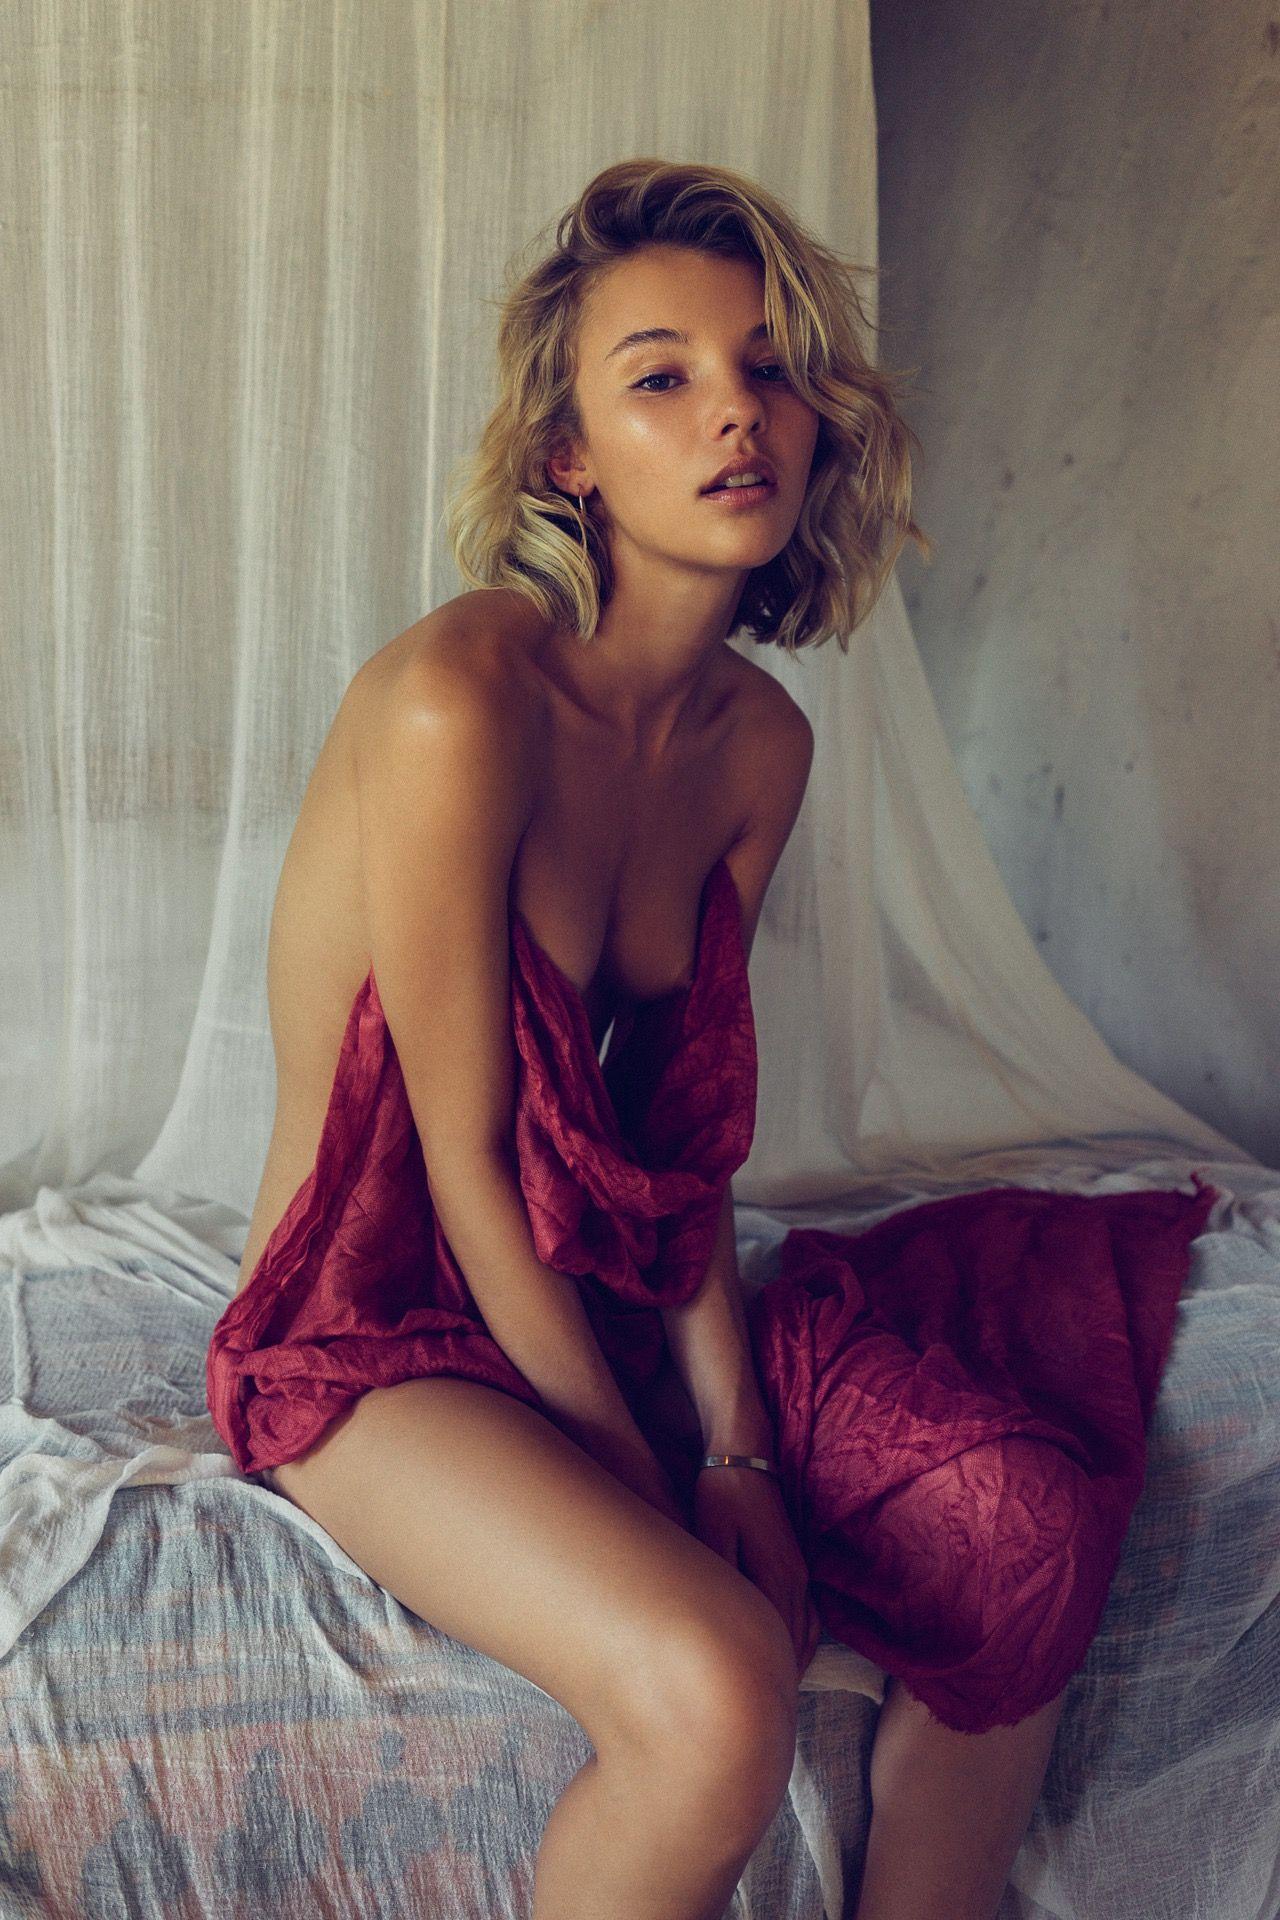 ICloud Loren Izabel nudes (98 foto and video), Sexy, Sideboobs, Instagram, legs 2018